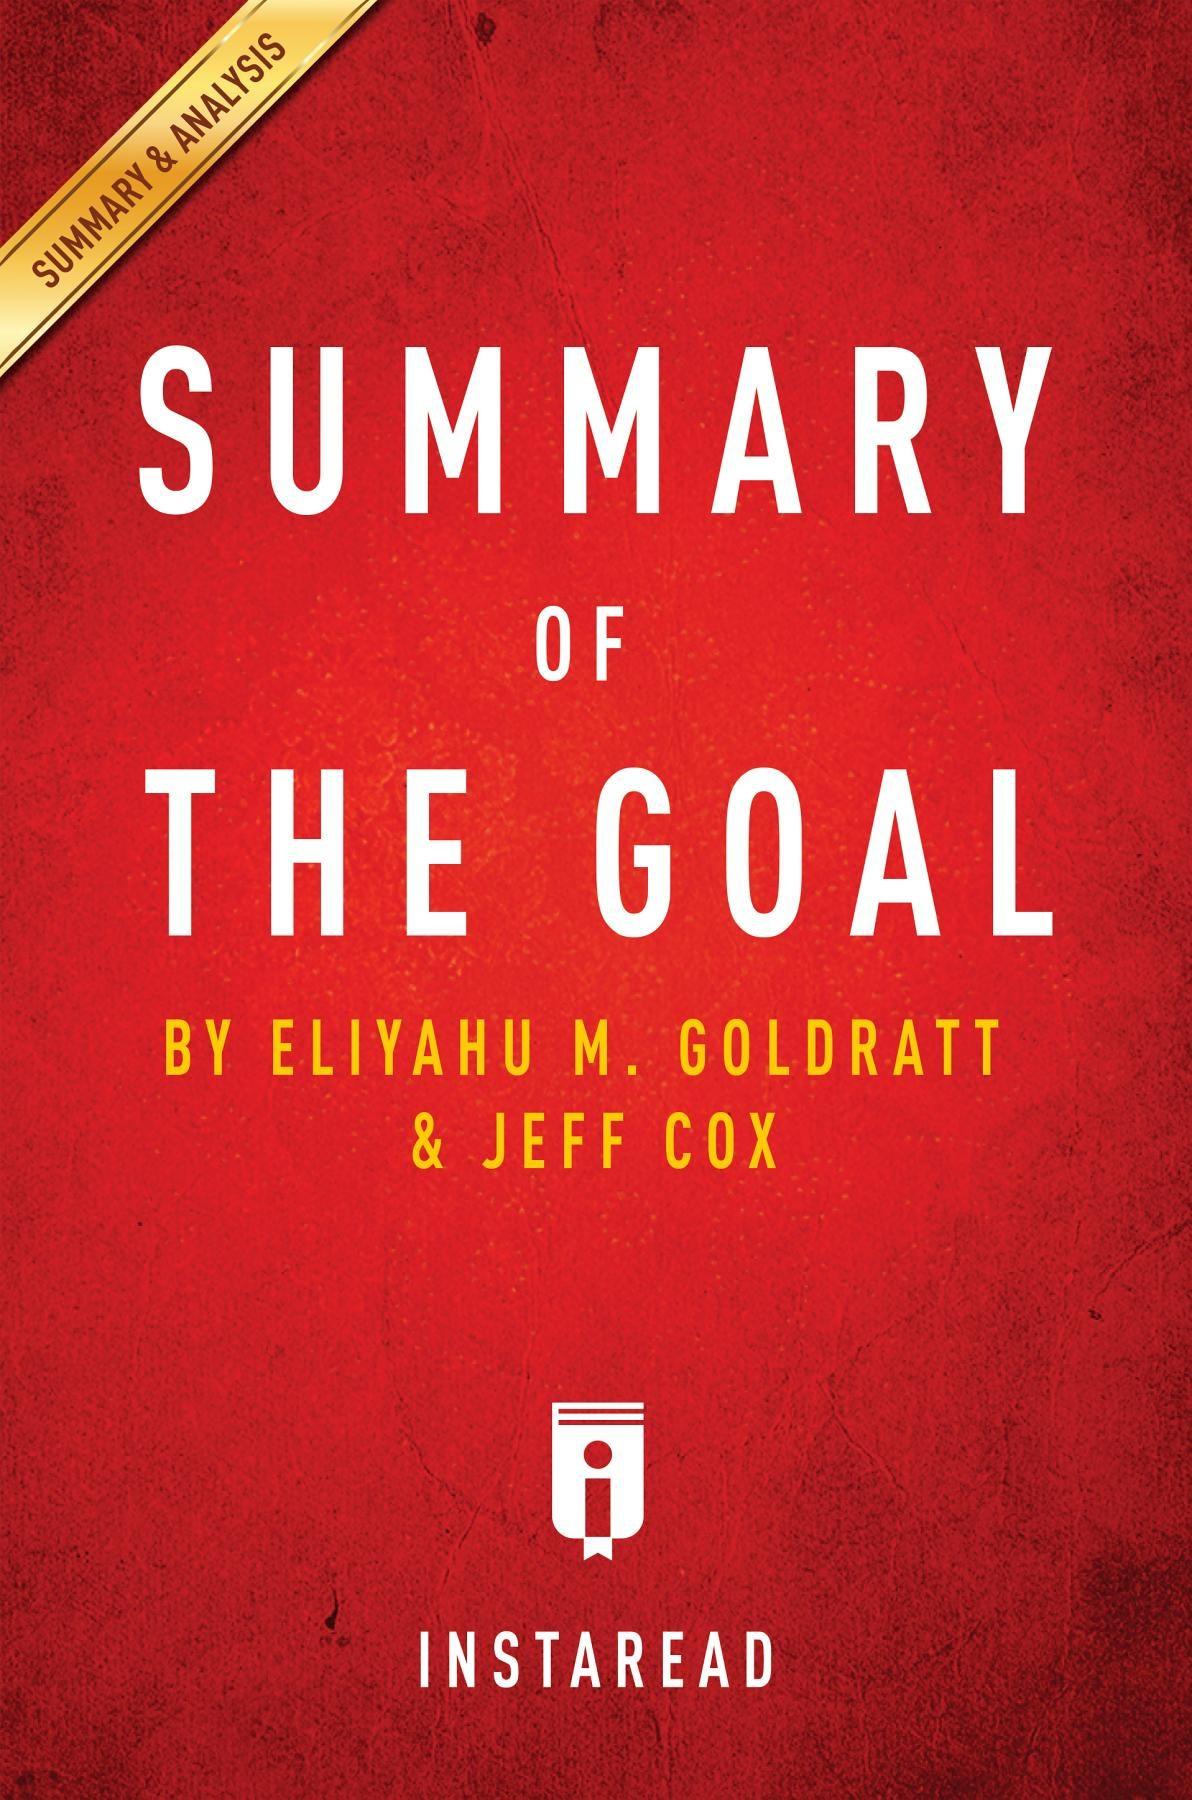 Summary Of The Goal (ebook)eliyahu M Goldrattjeff Cox